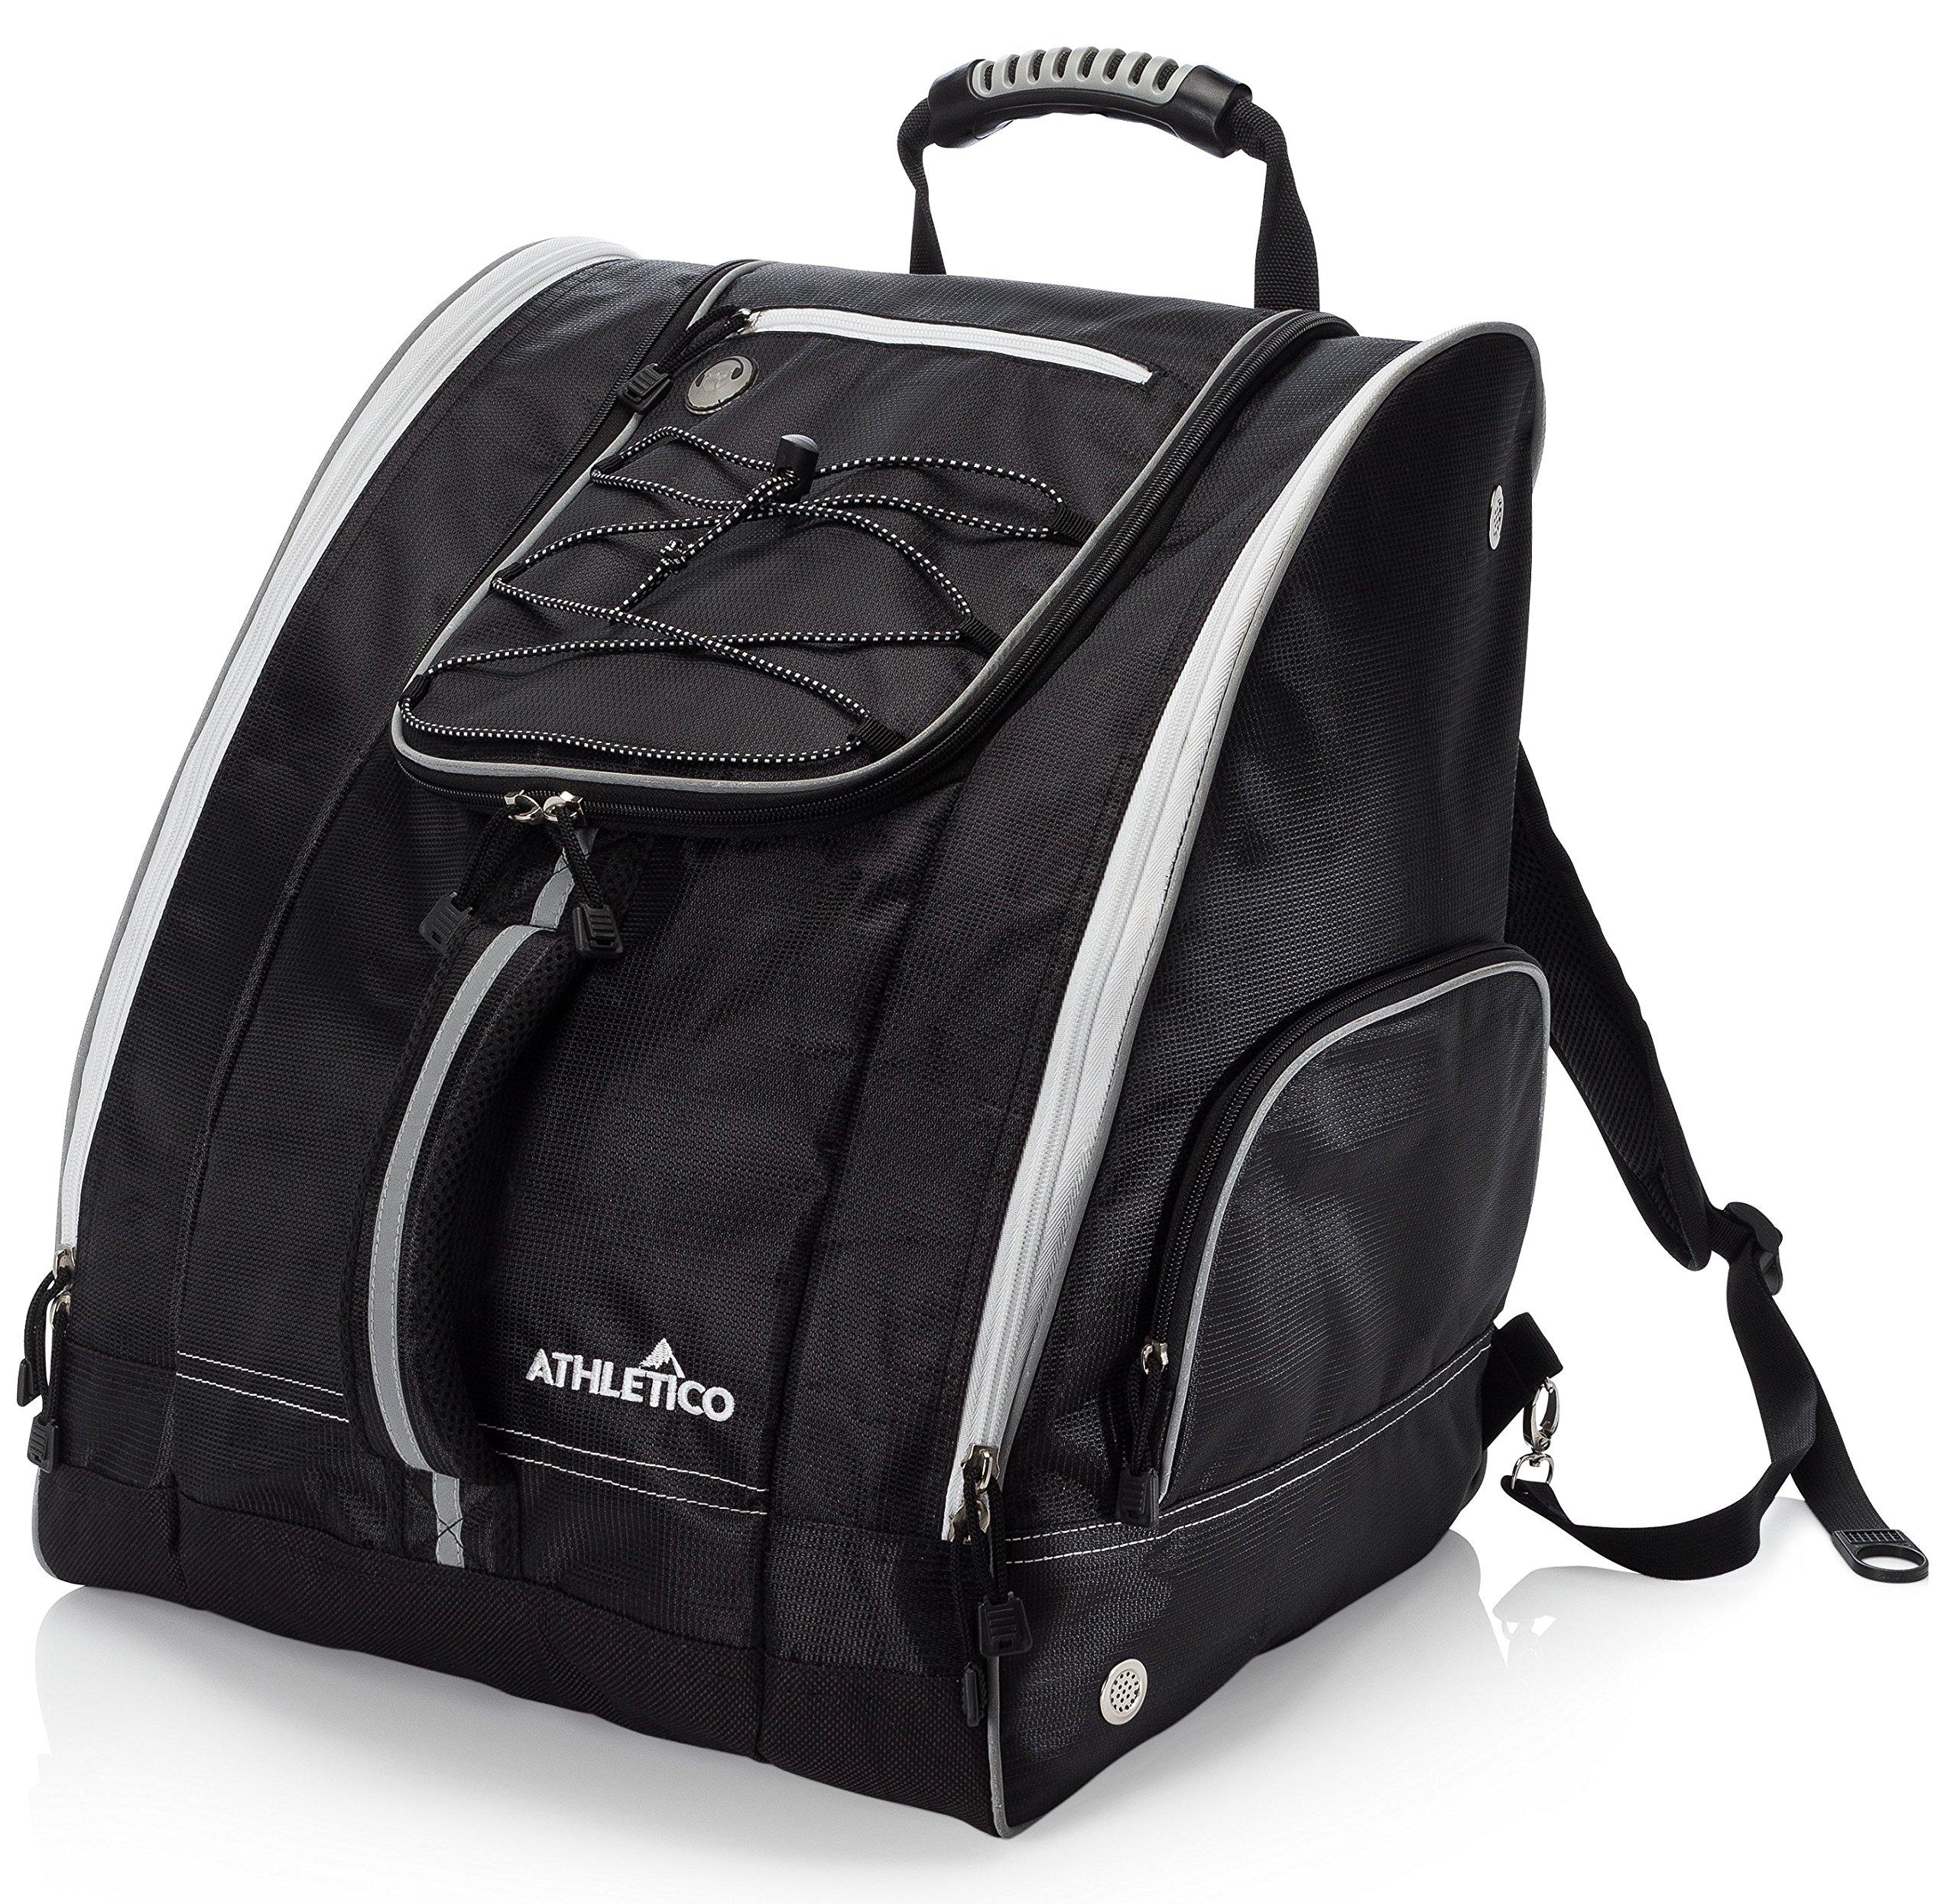 Athletico Ski Boot Bag - Skiing and Snowboarding Travel Luggage ...